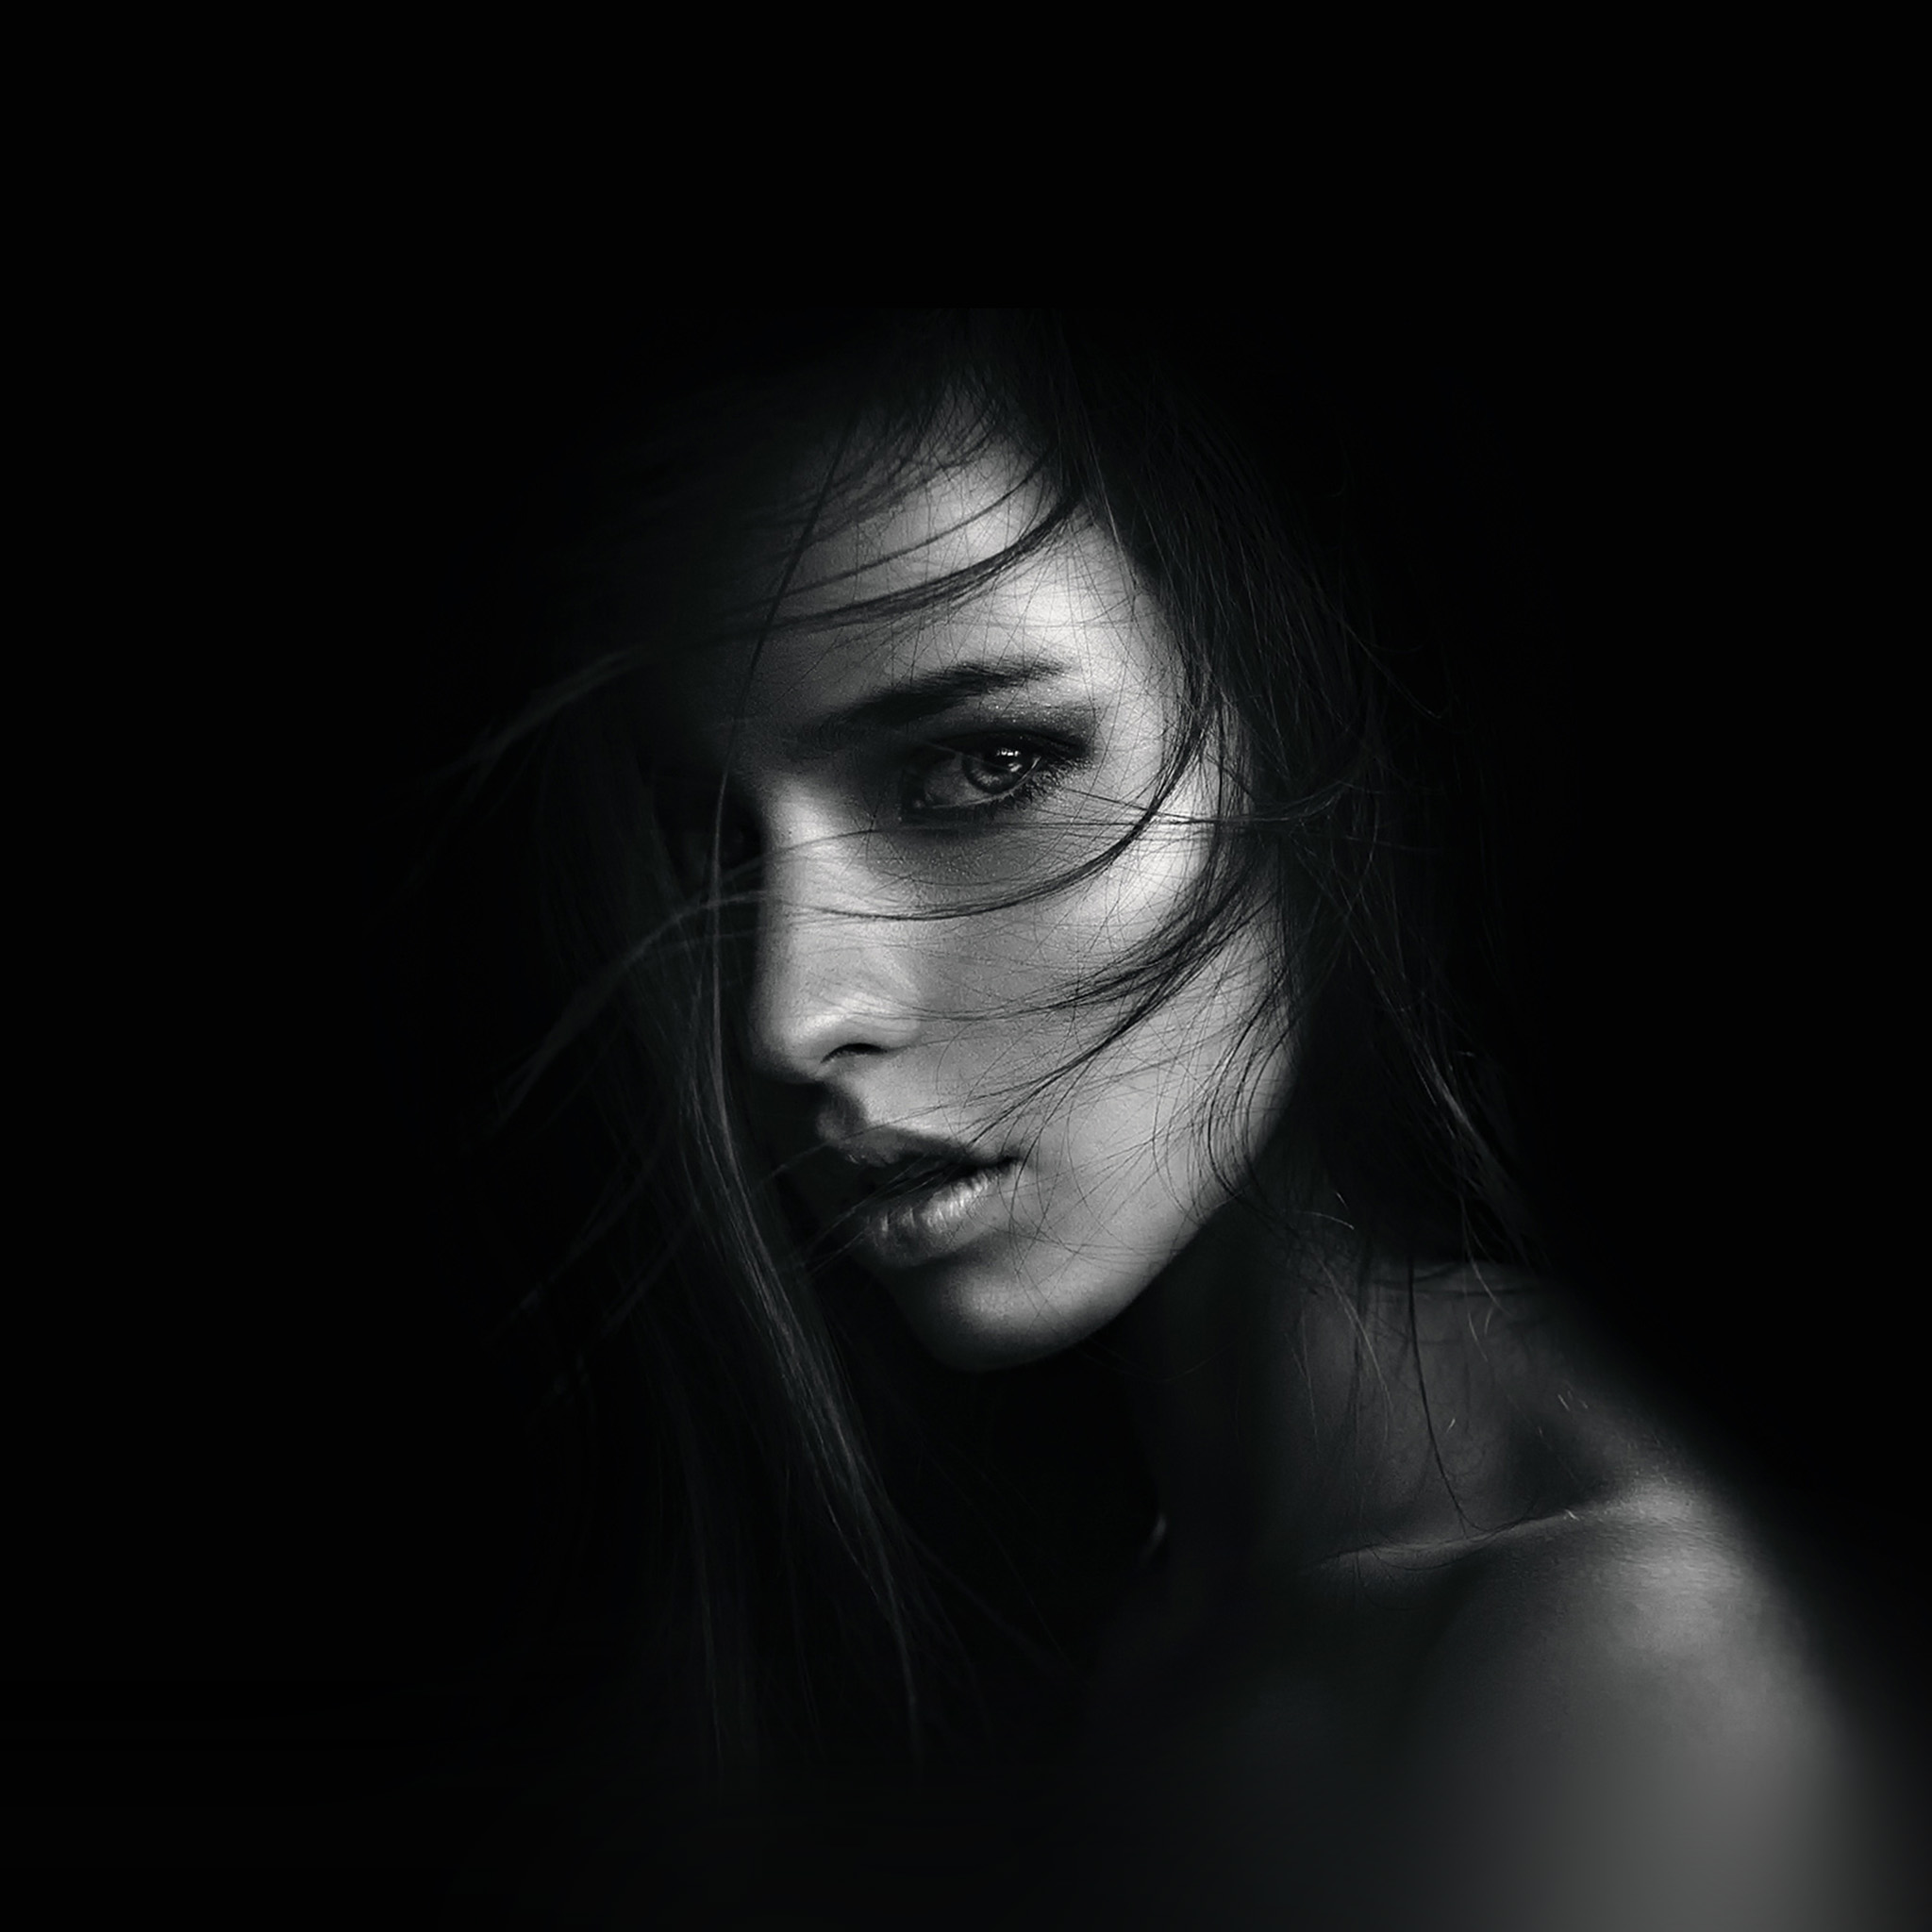 Hi24-dark-girl-face-sexy-wallpaper